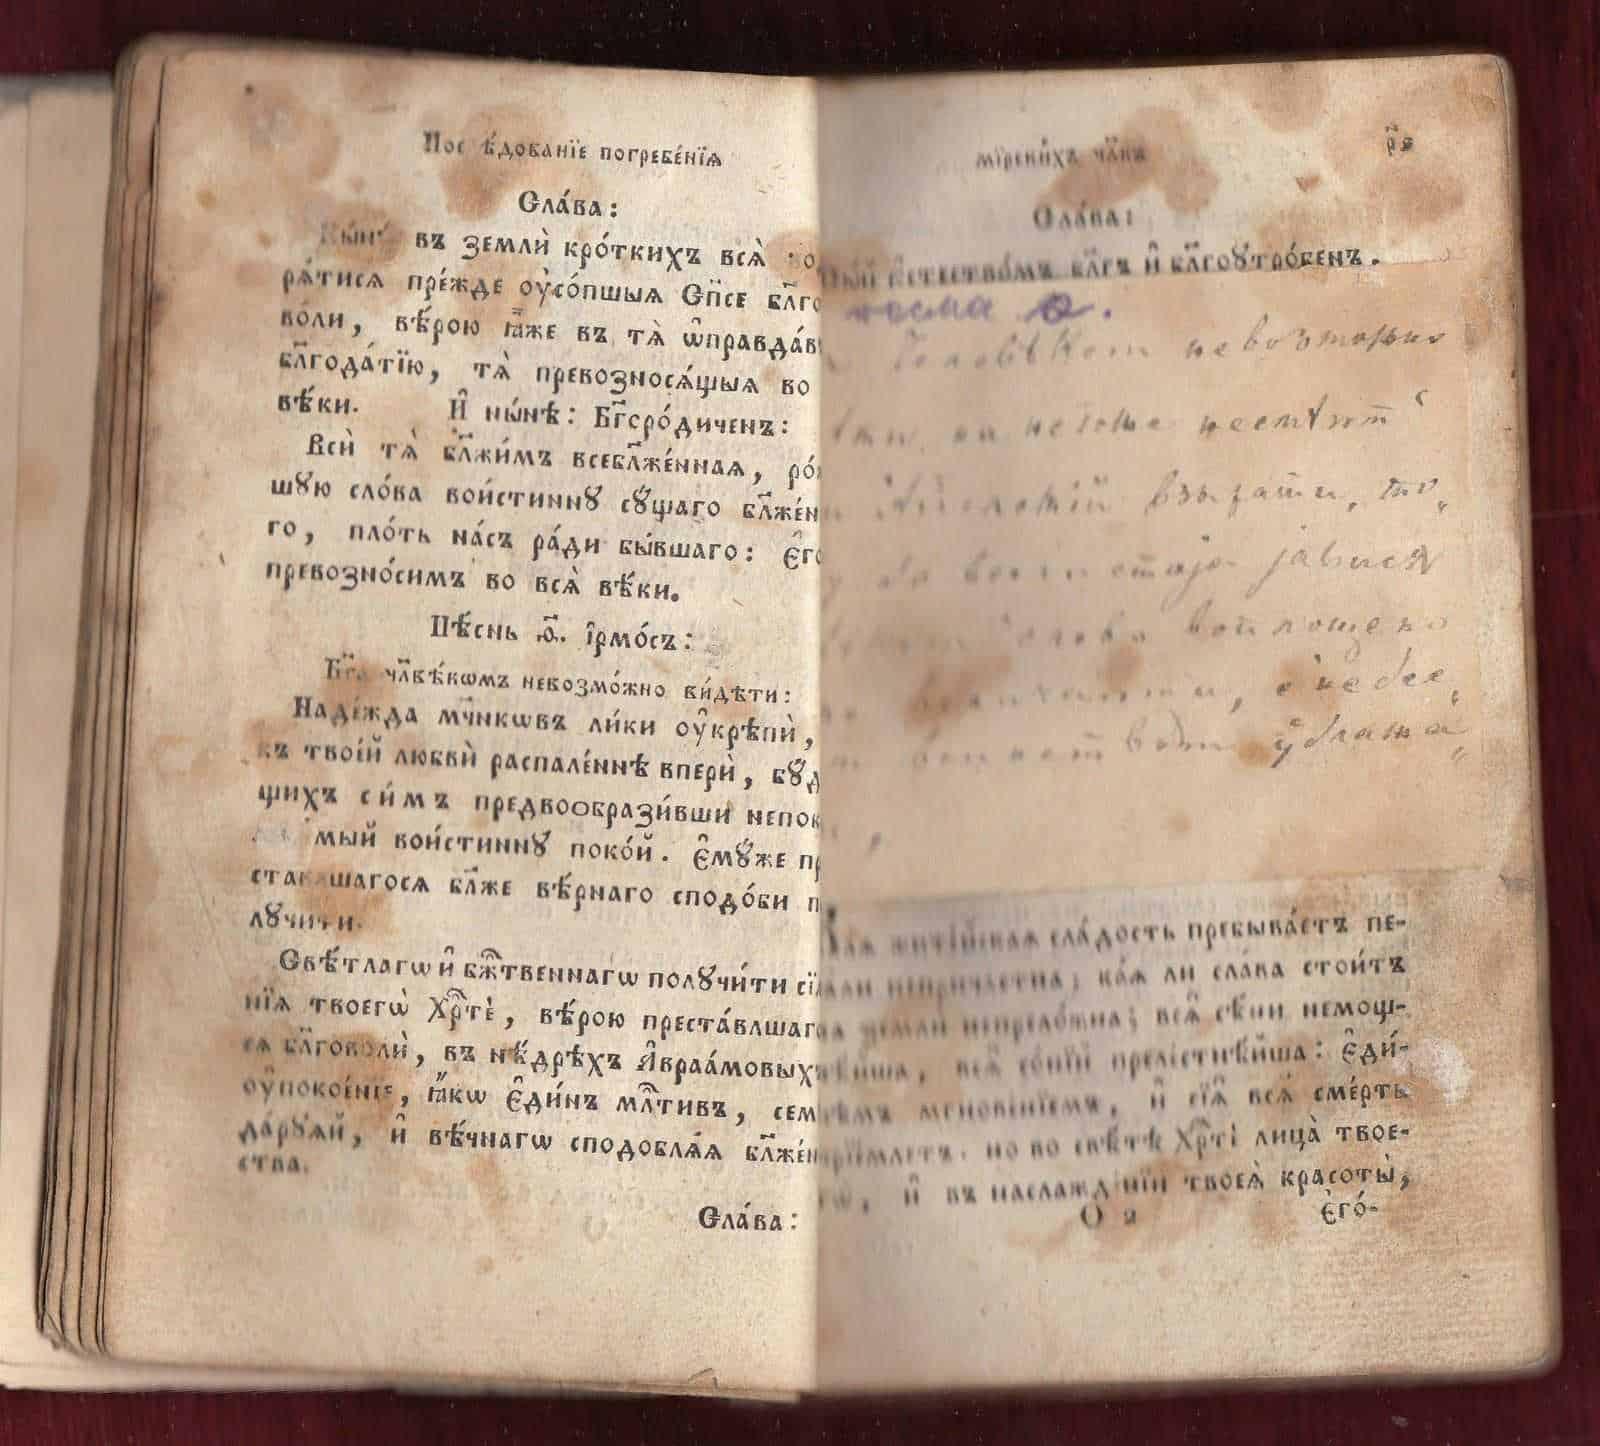 19c-Posledovanie-Acolouthia-e-Old-Slavonic-Inscribed-Manuscript-401146479031-5